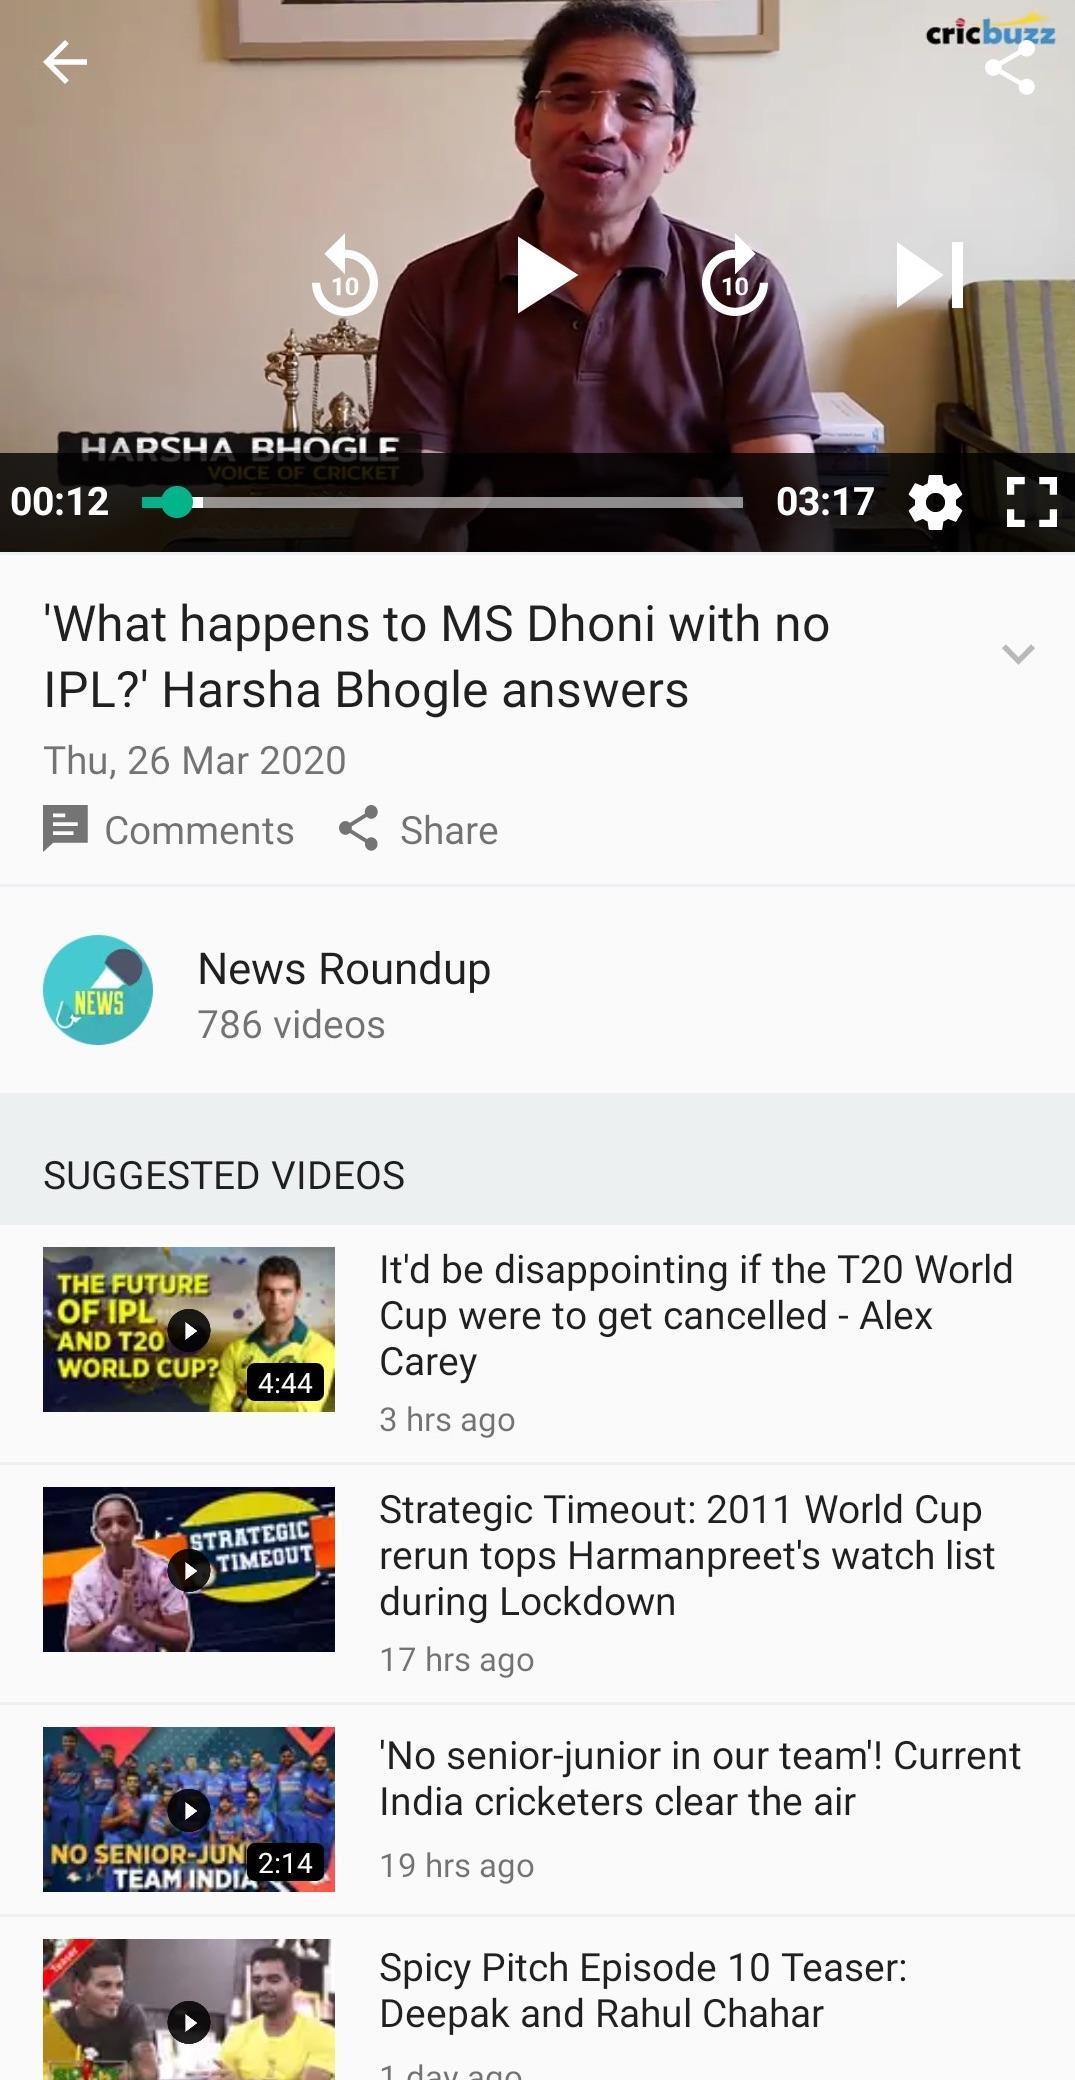 Cricbuzz Live Cricket Scores & News 4.8.003 Screenshot 6